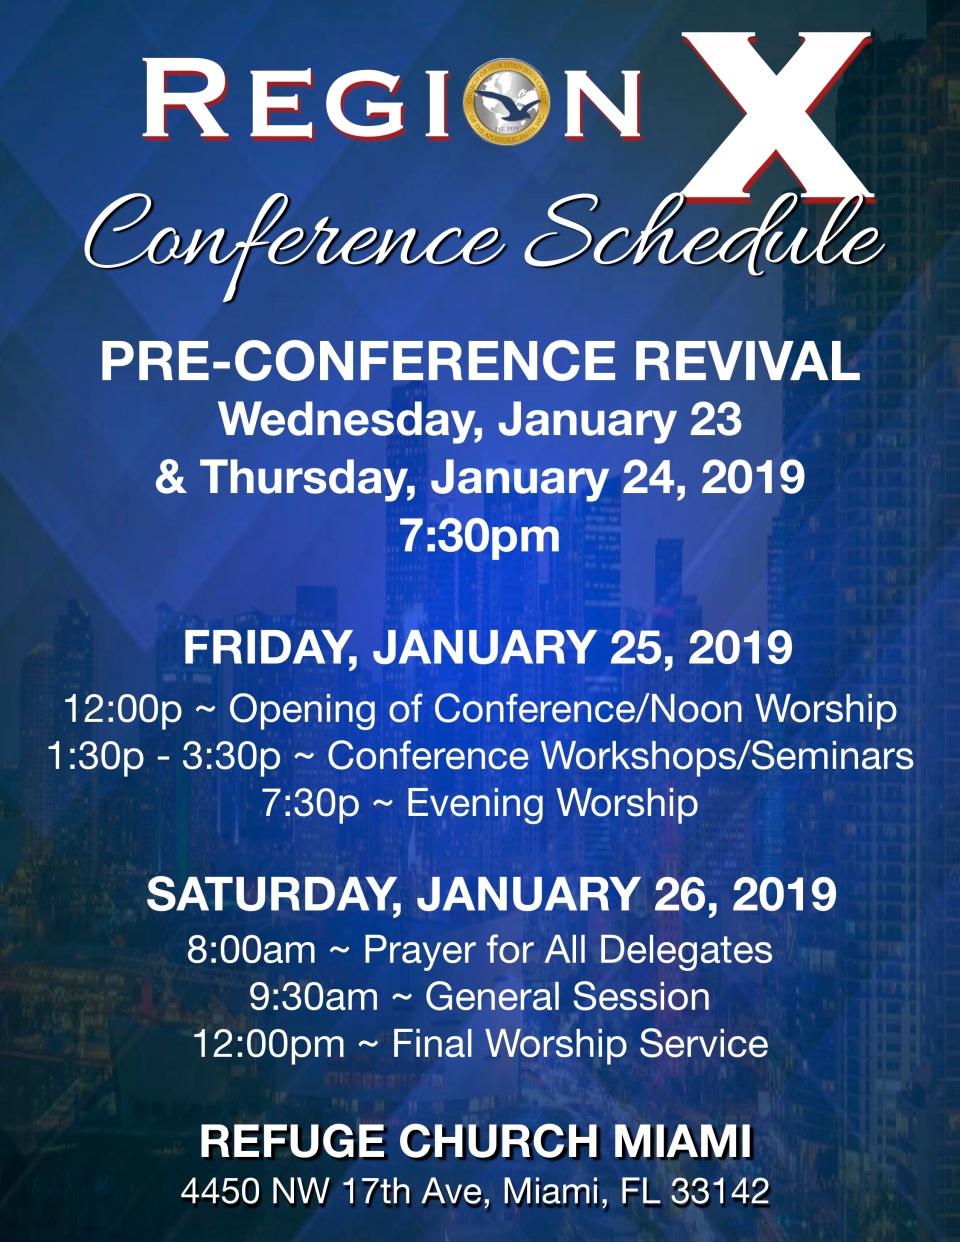 region x conference schedule 2019